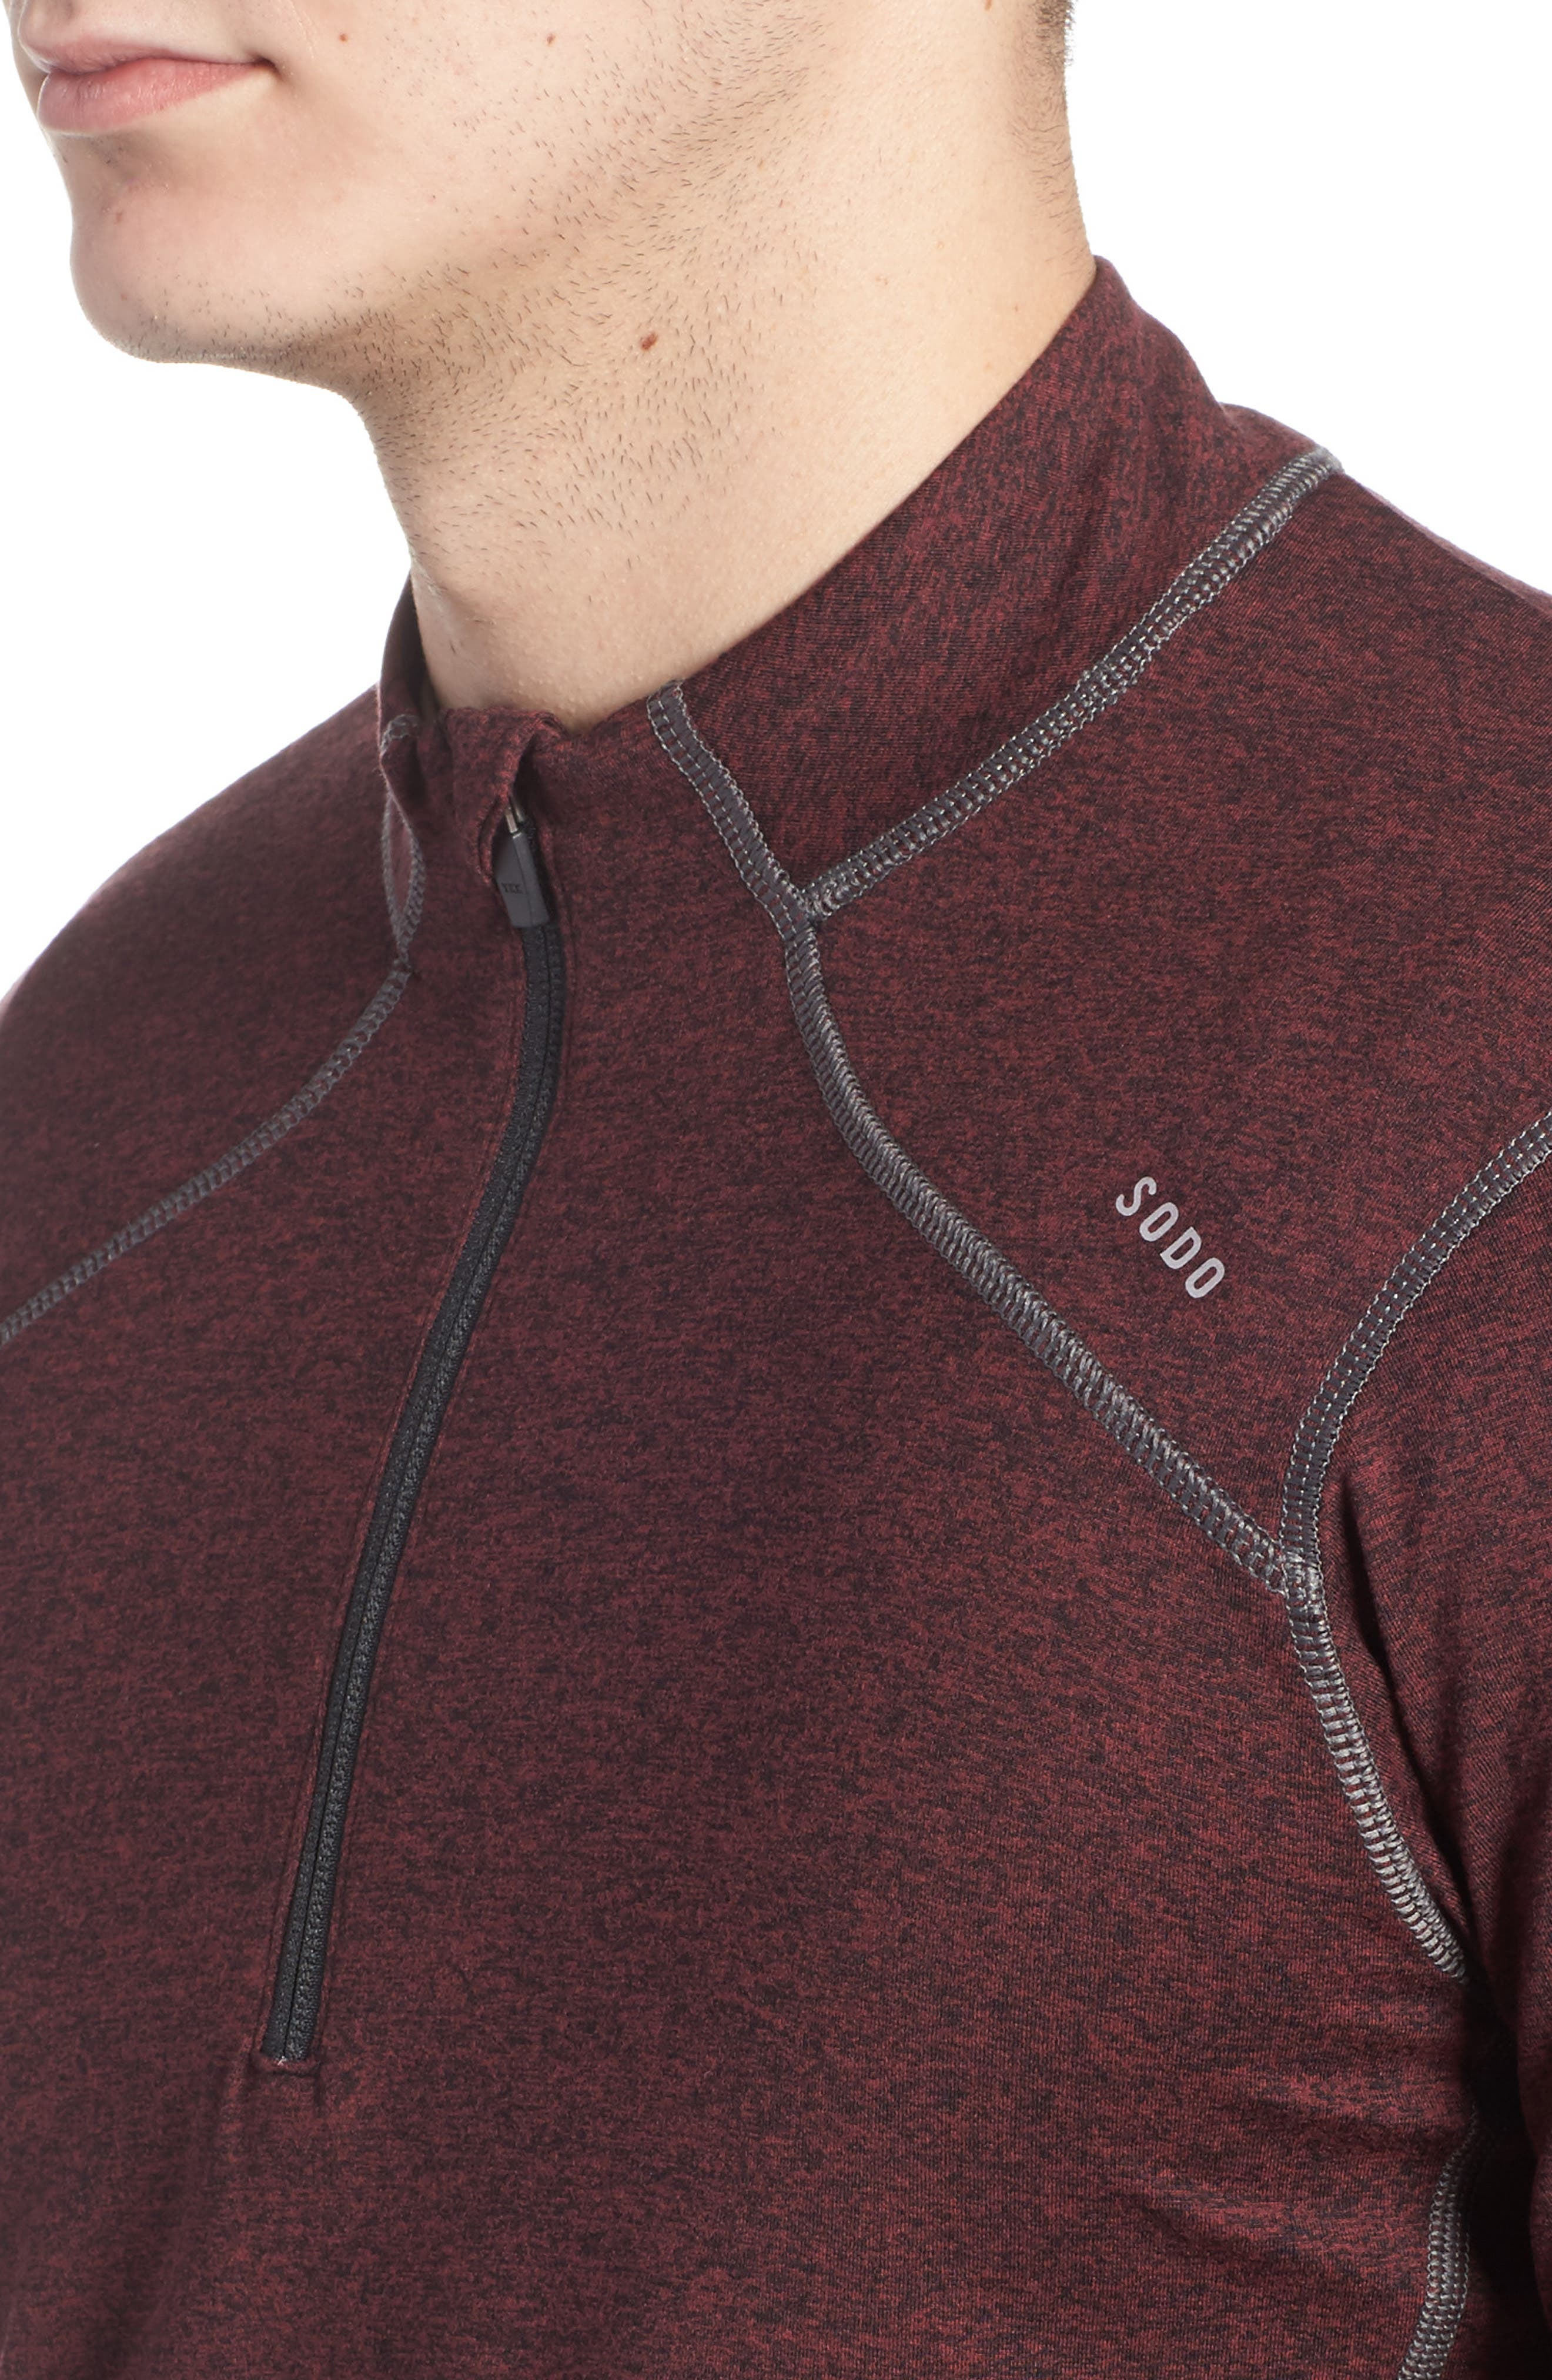 Alternate Image 3  - SODO 'Elevate' Moisture Wicking Stretch Quarter Zip Pullover